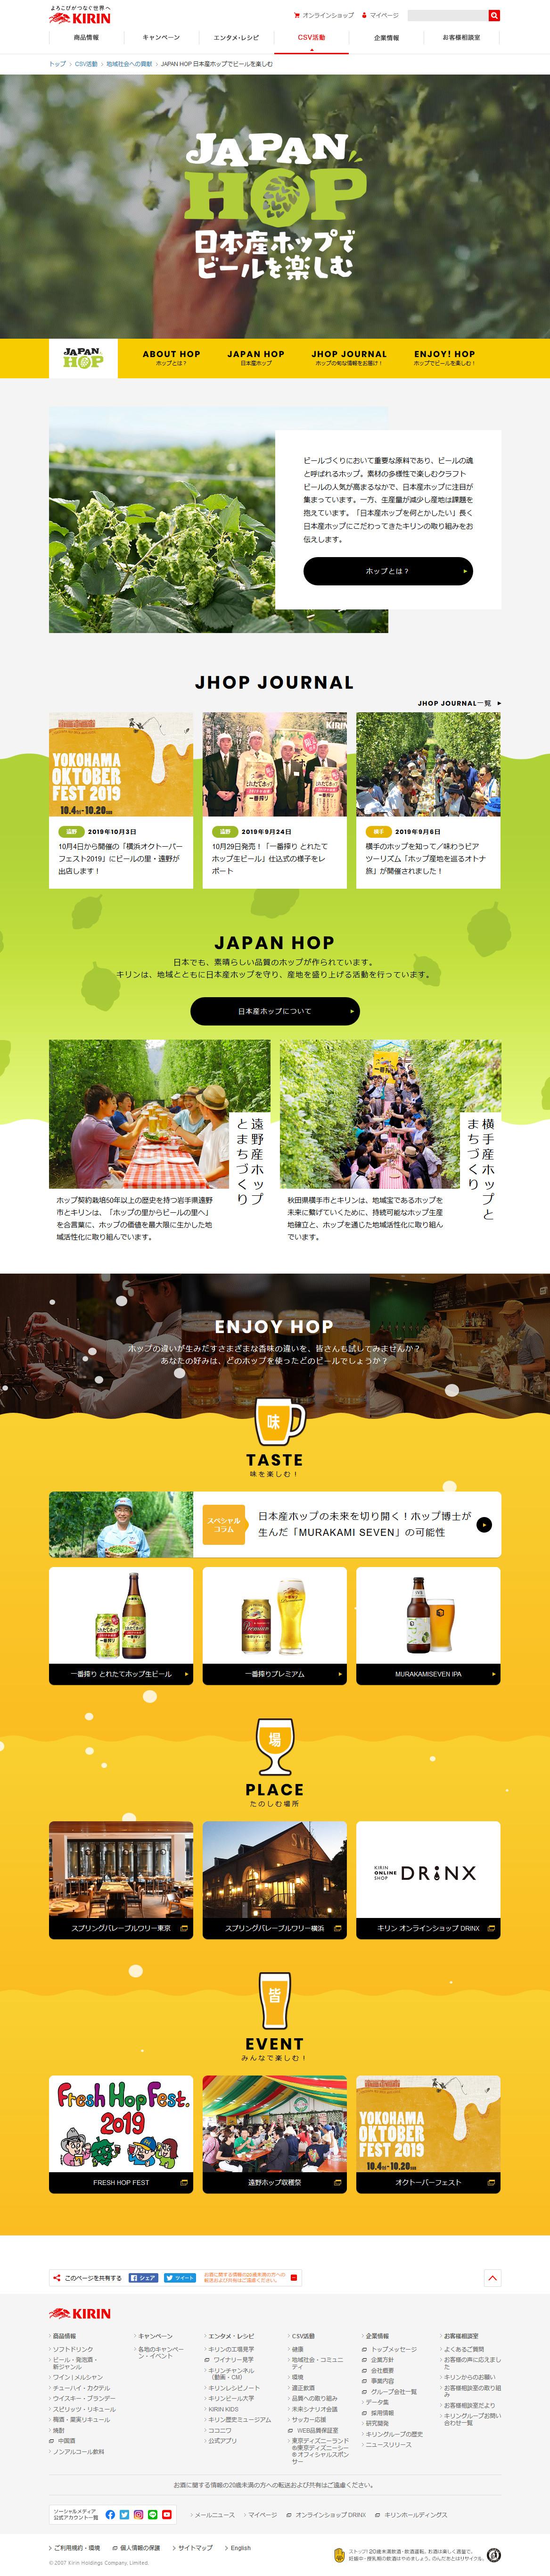 JAPAN HOP 日本産ホップでビールを楽しむ